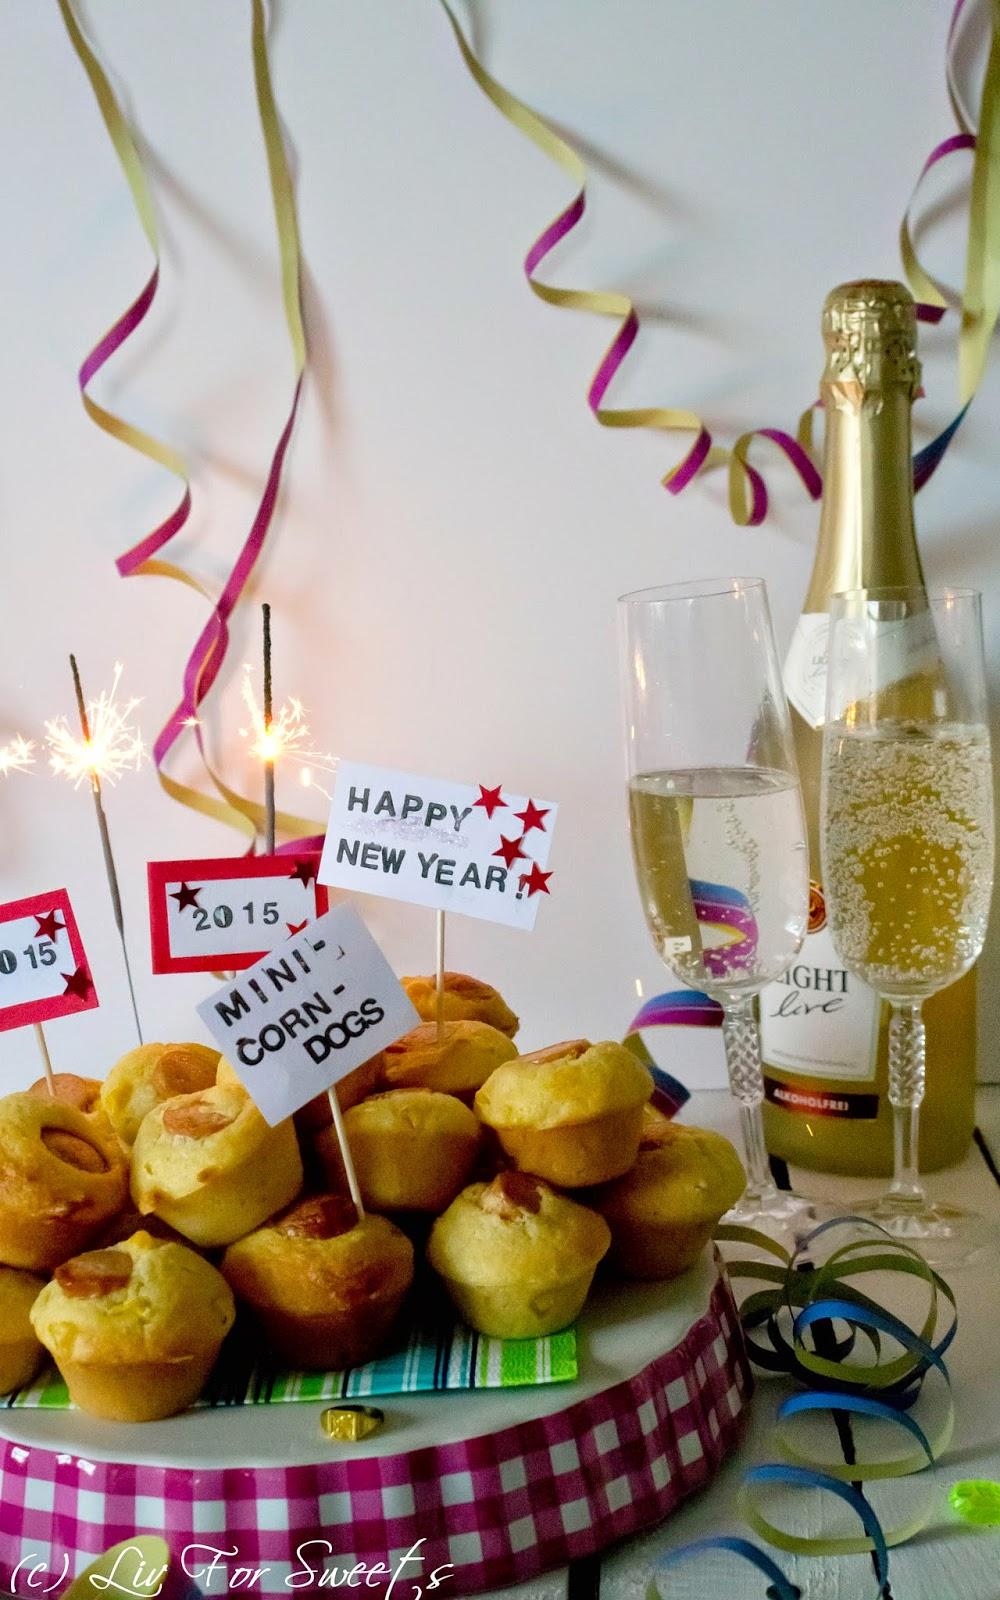 Mini-Corn-Dogs, Mini-Muffinform, Würstchen, Mais, Polenta, Käse, Silvester, Happy New Year, Rezept auch für den Thermomix